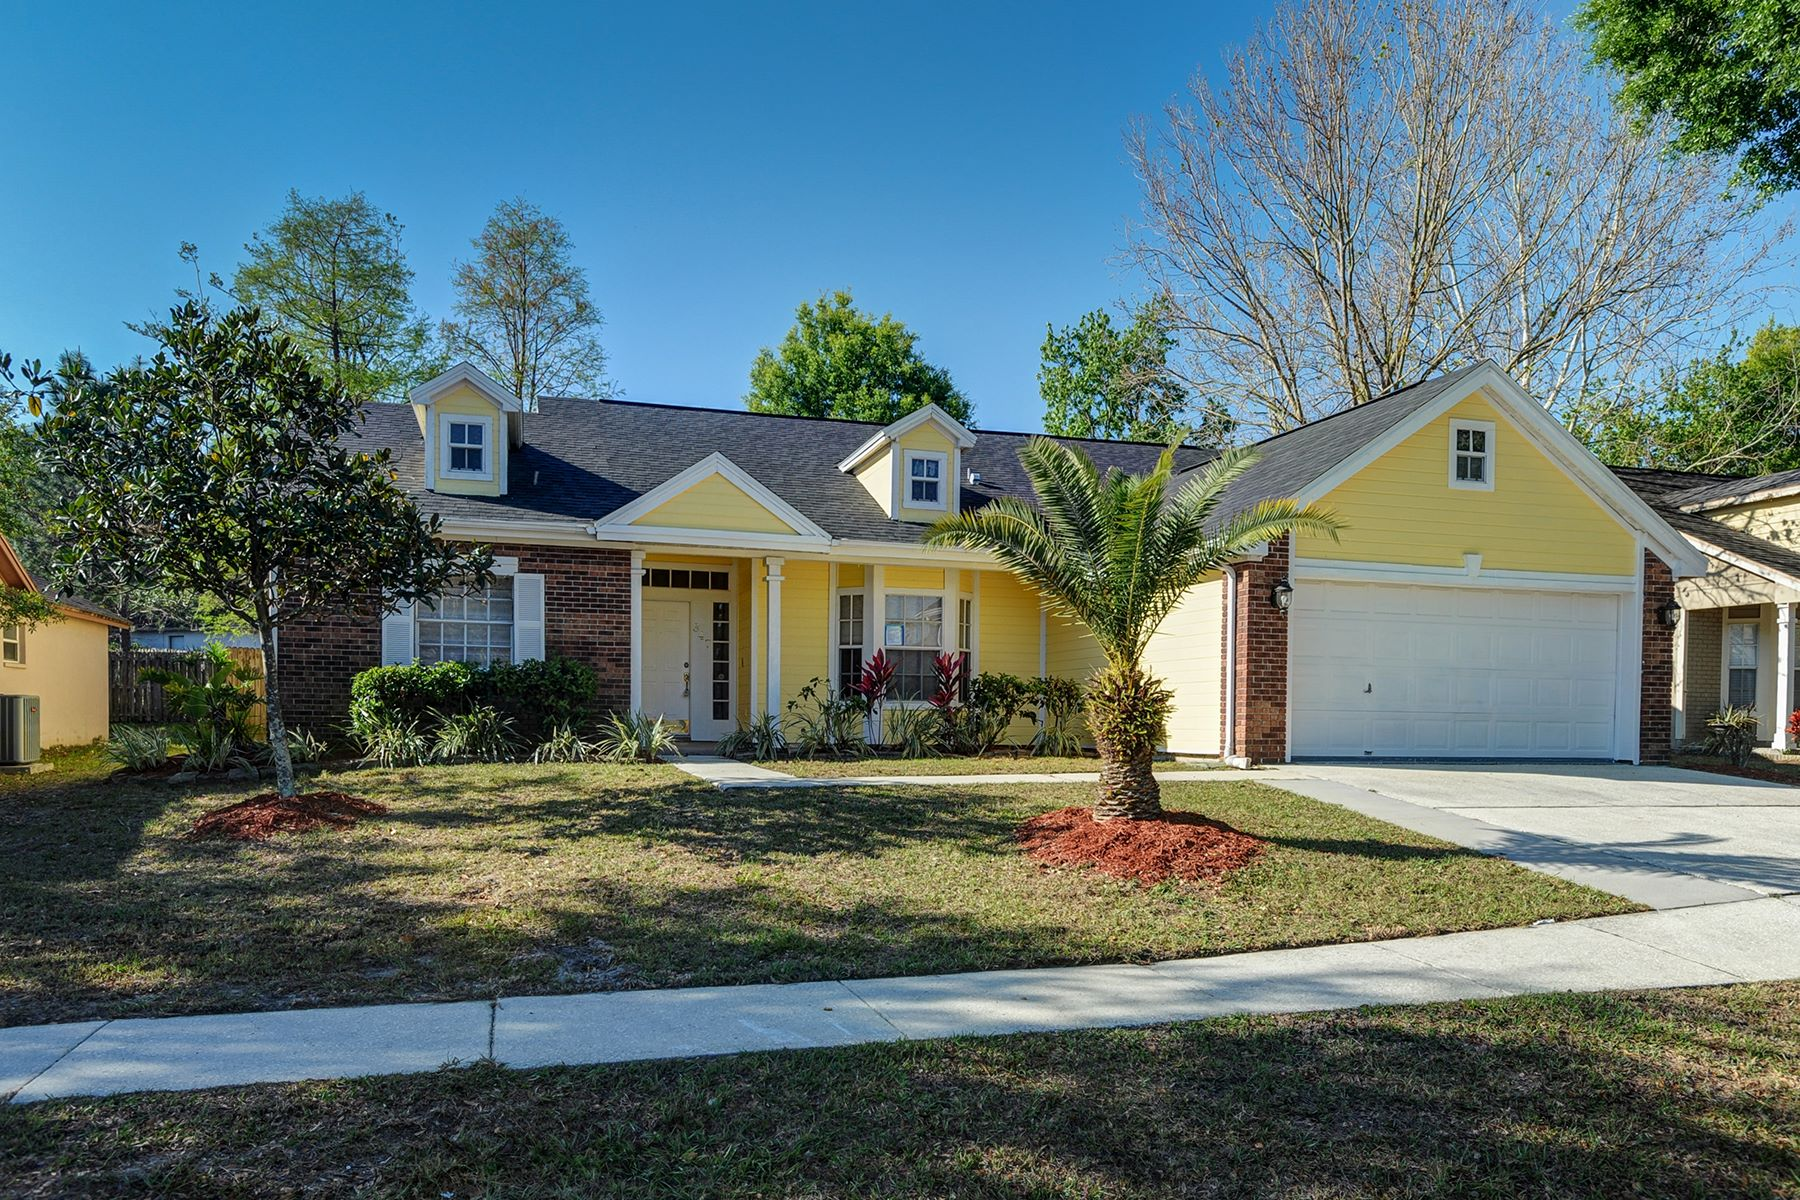 Single Family Home for Sale at BRANDON 847 Greenbelt Cir, Brandon, Florida 33510 United States